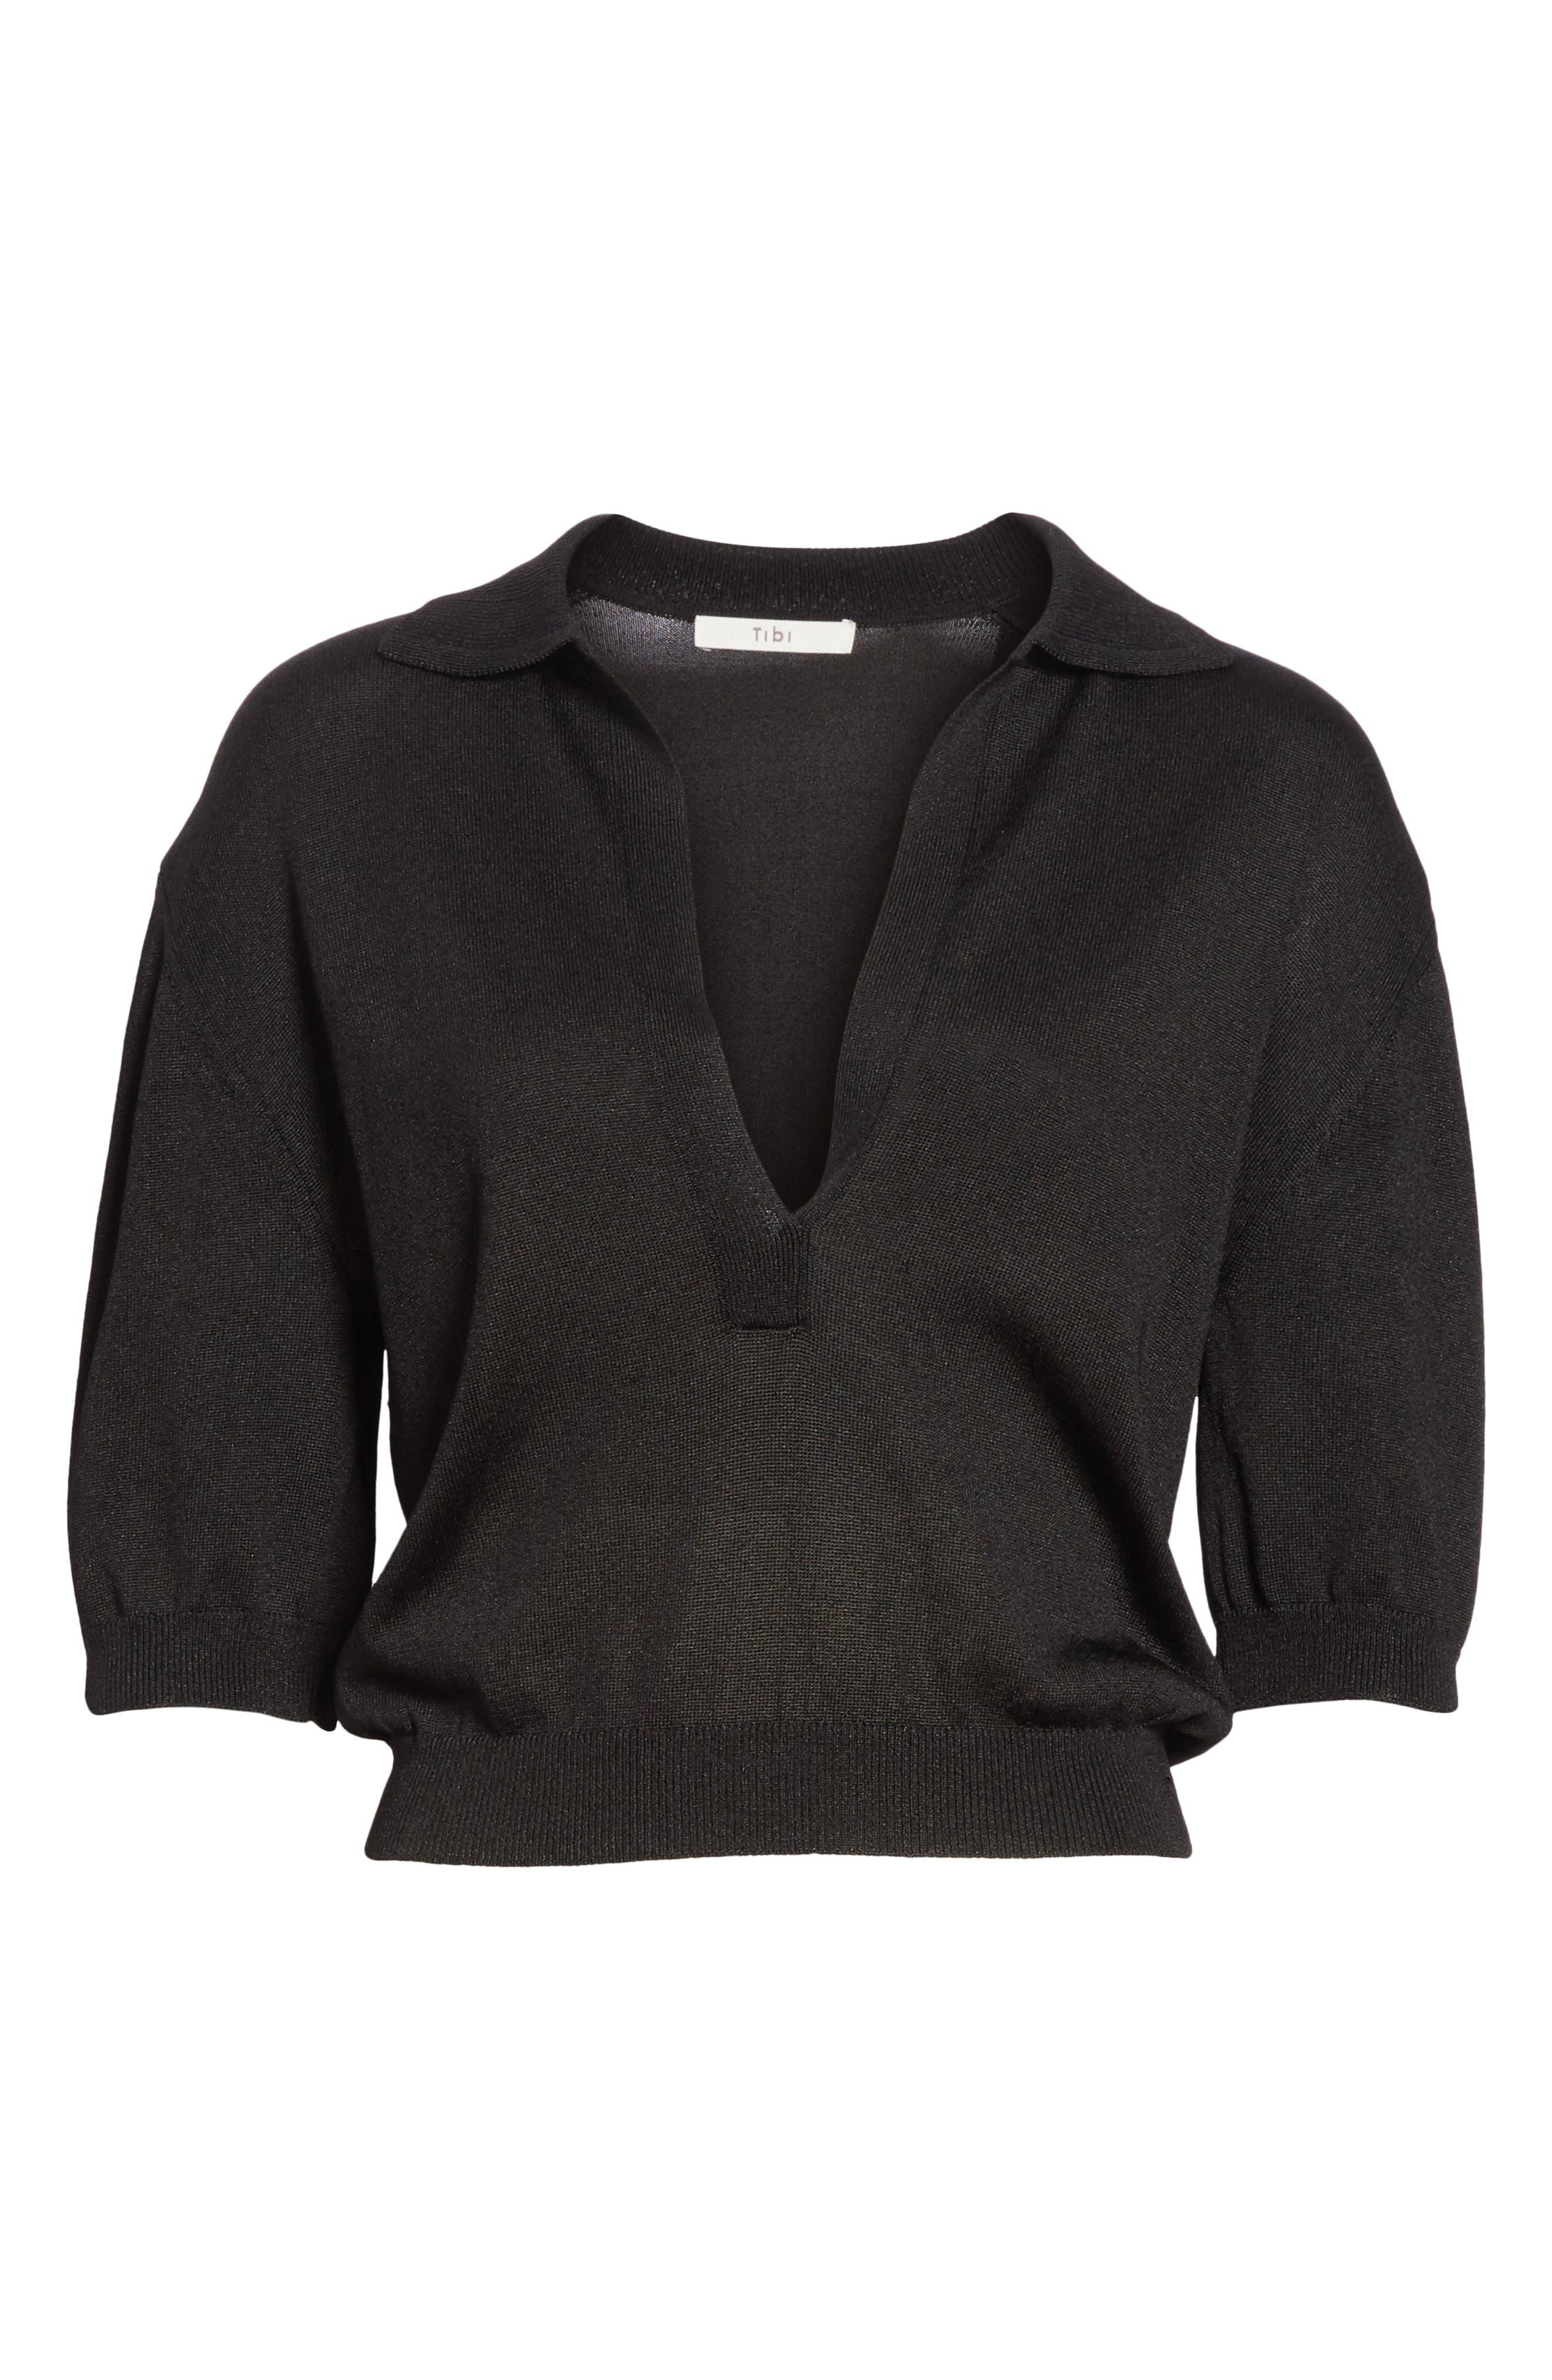 Crop Knit Pullover,                             Alternate thumbnail 7, color,                             Black